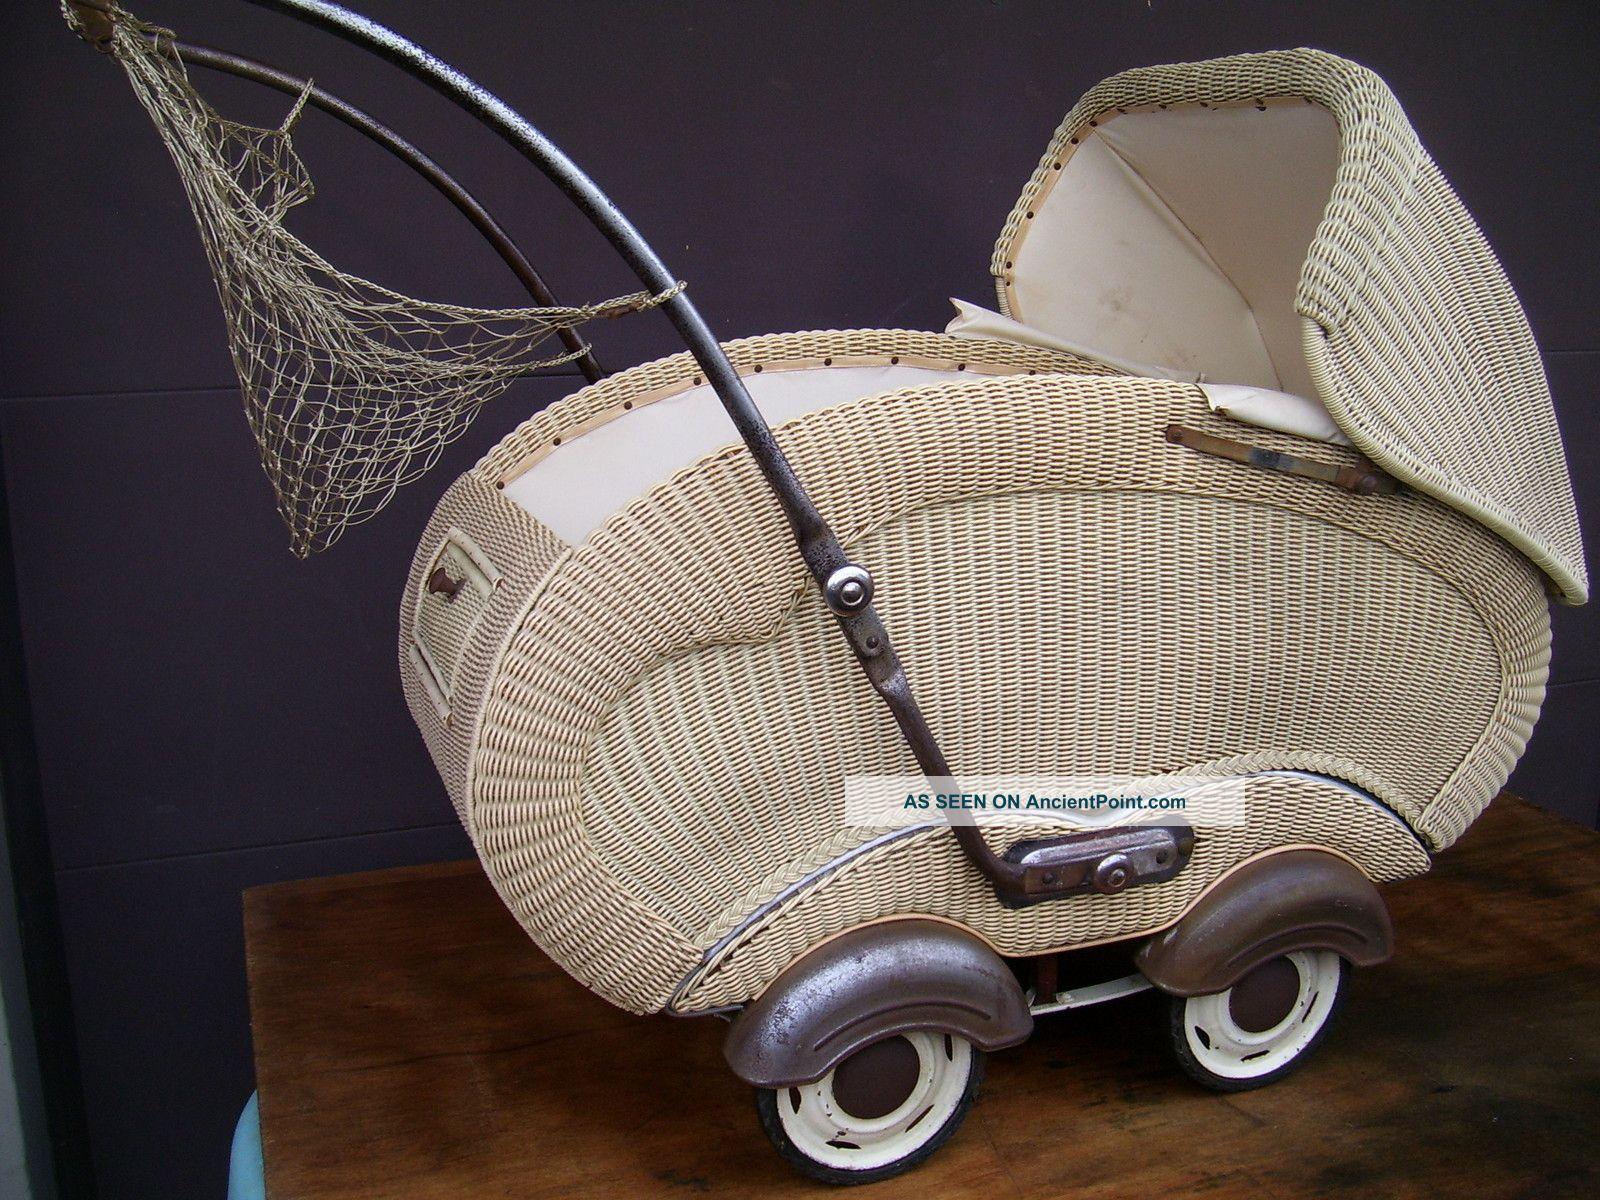 Midcentury Modern German Design Plastic Wicker Buggie Convertable Baby Stroller Baby Carriages & Buggies photo